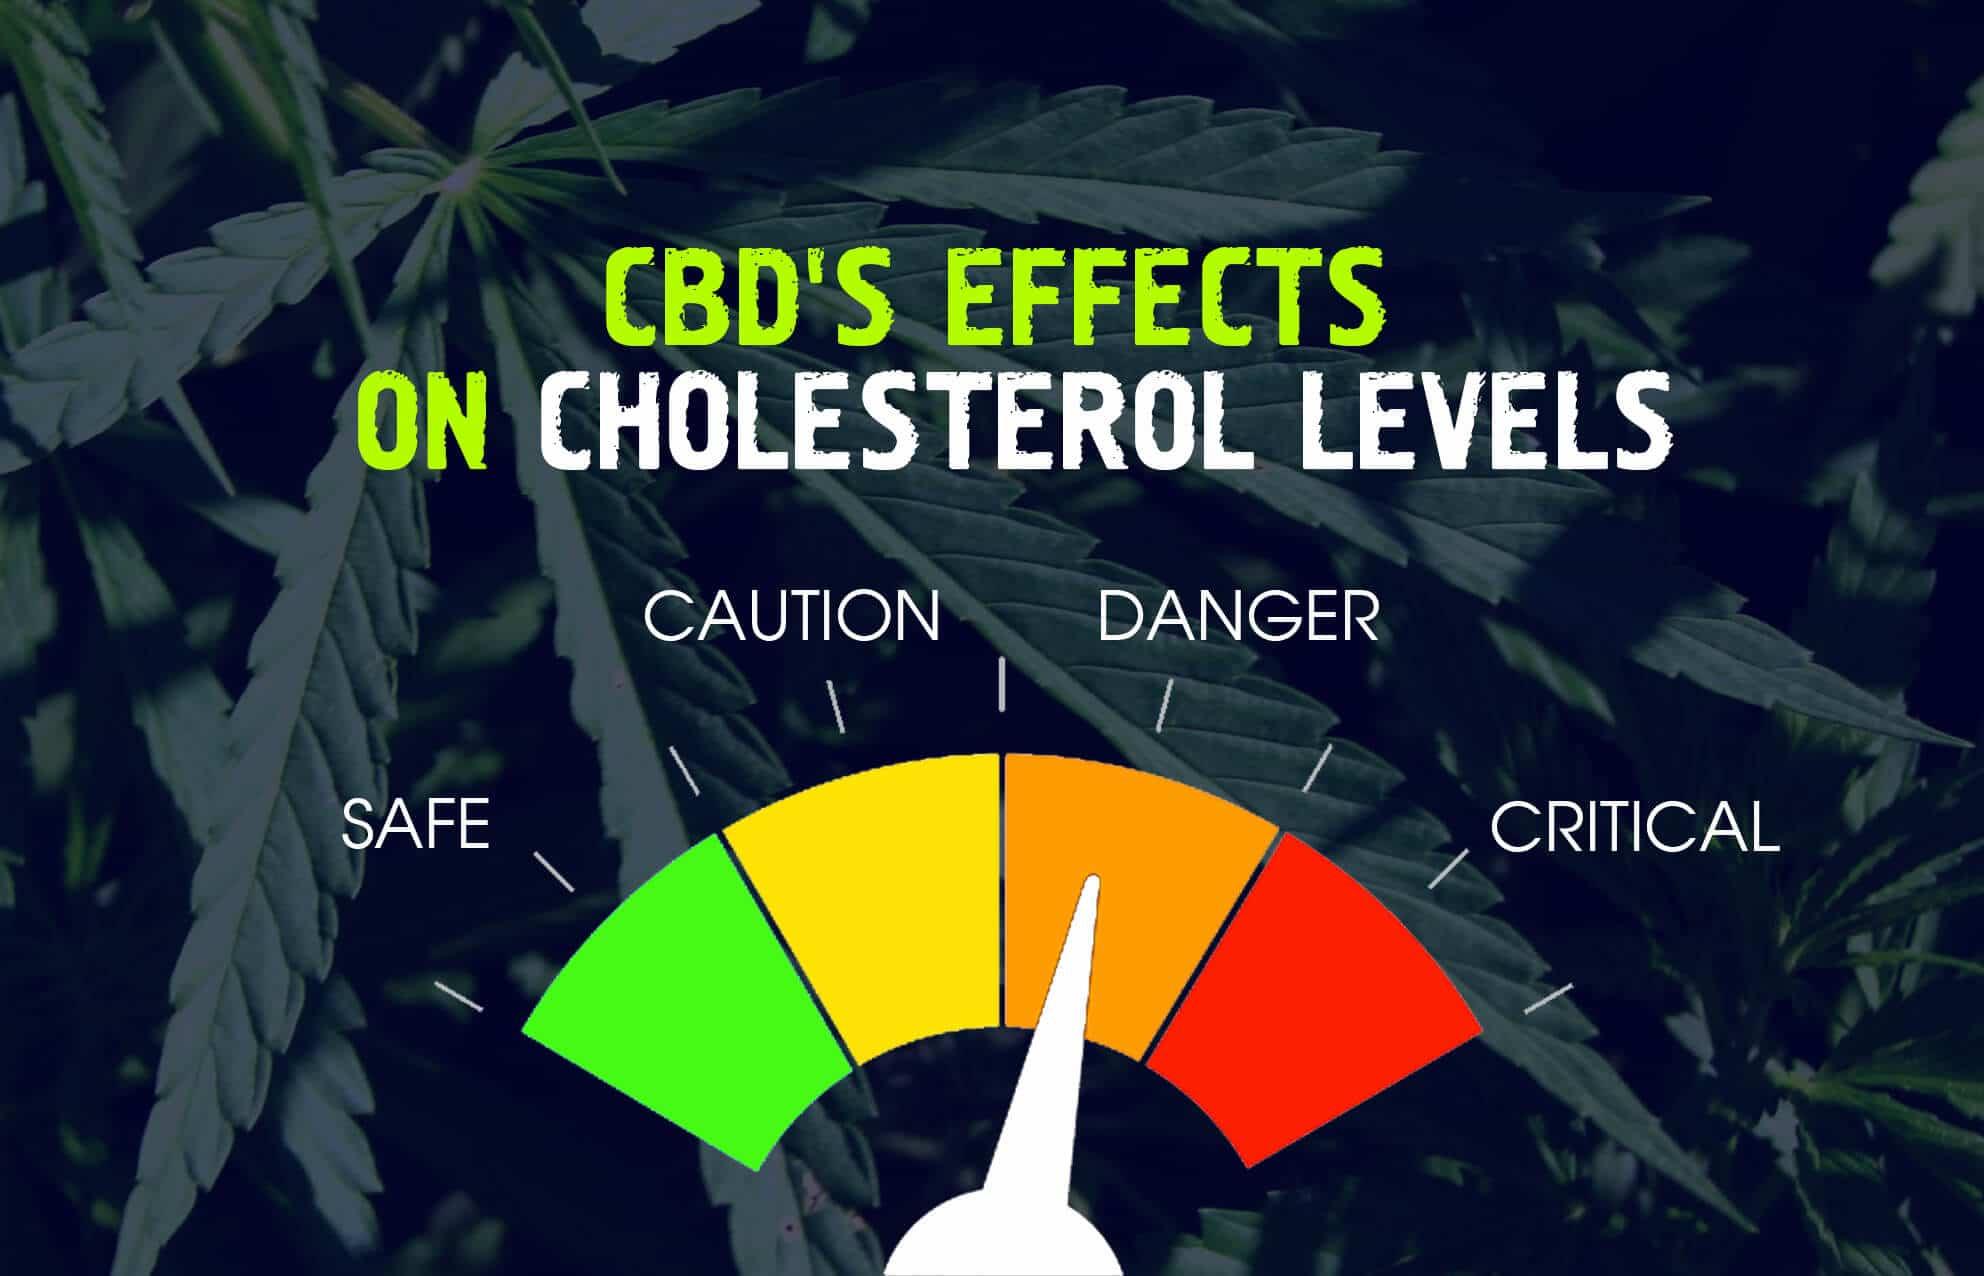 CBD's Effects on Cholesterol Levels